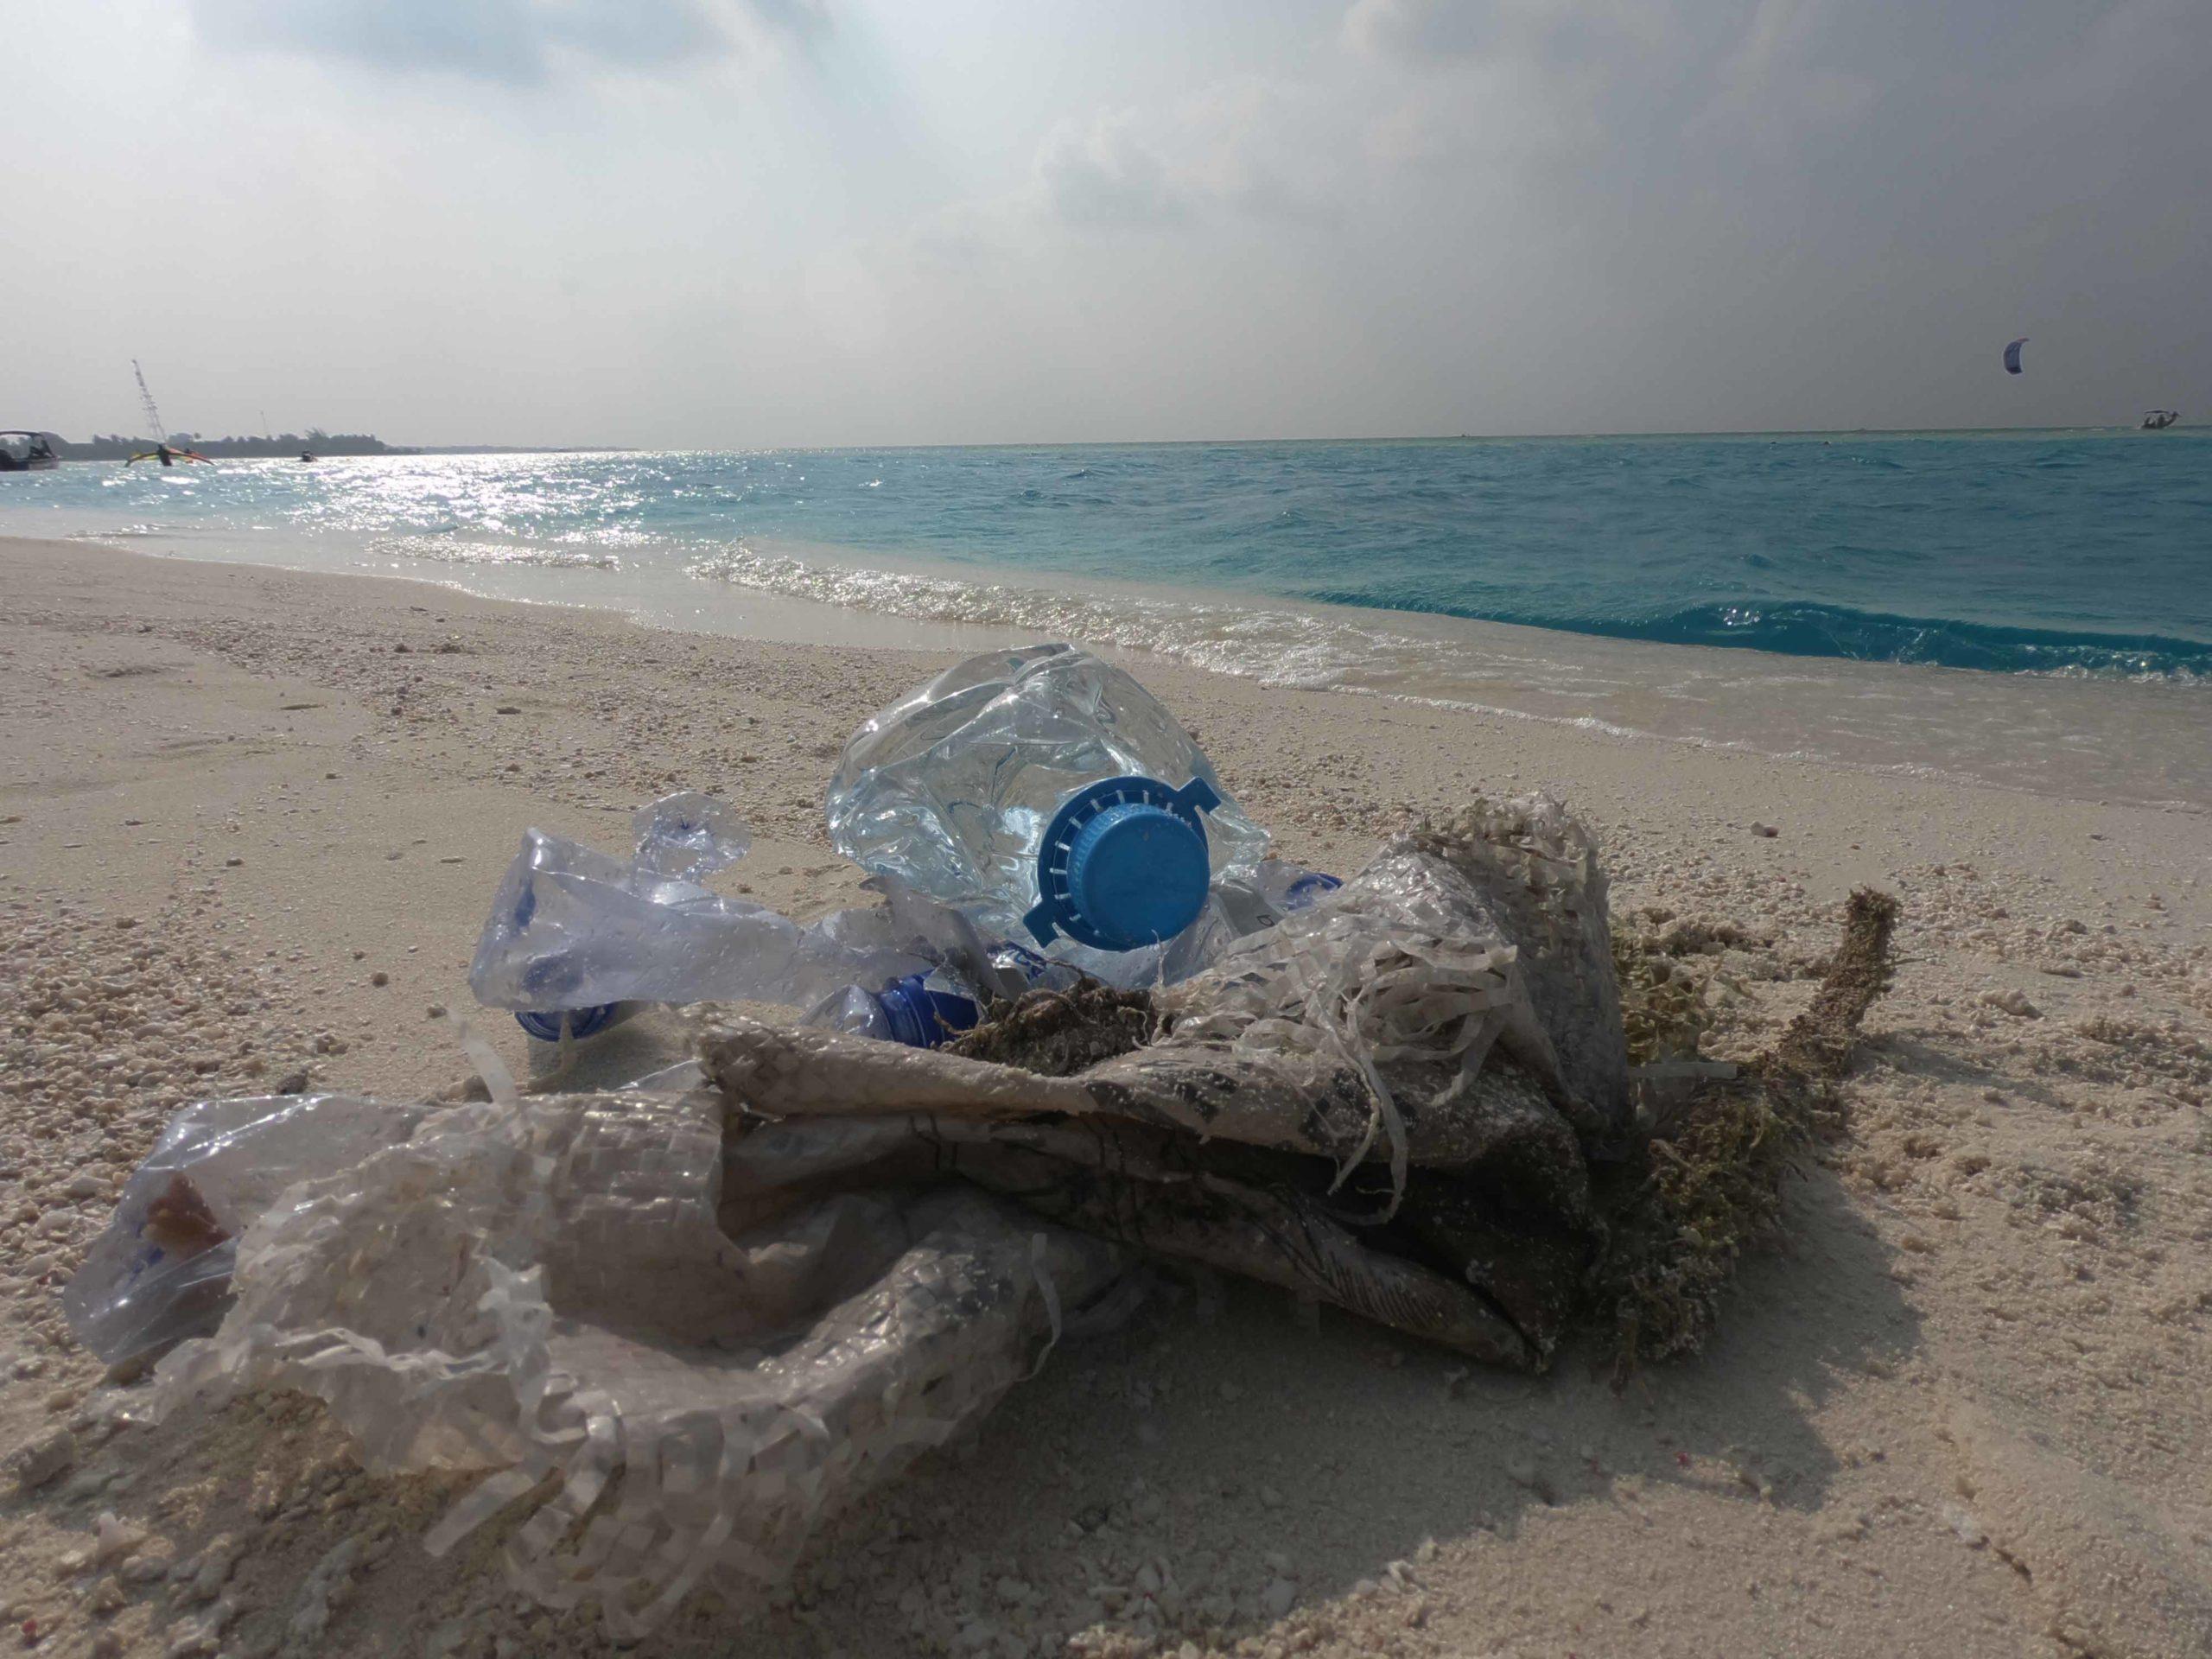 Verein Ozeankind